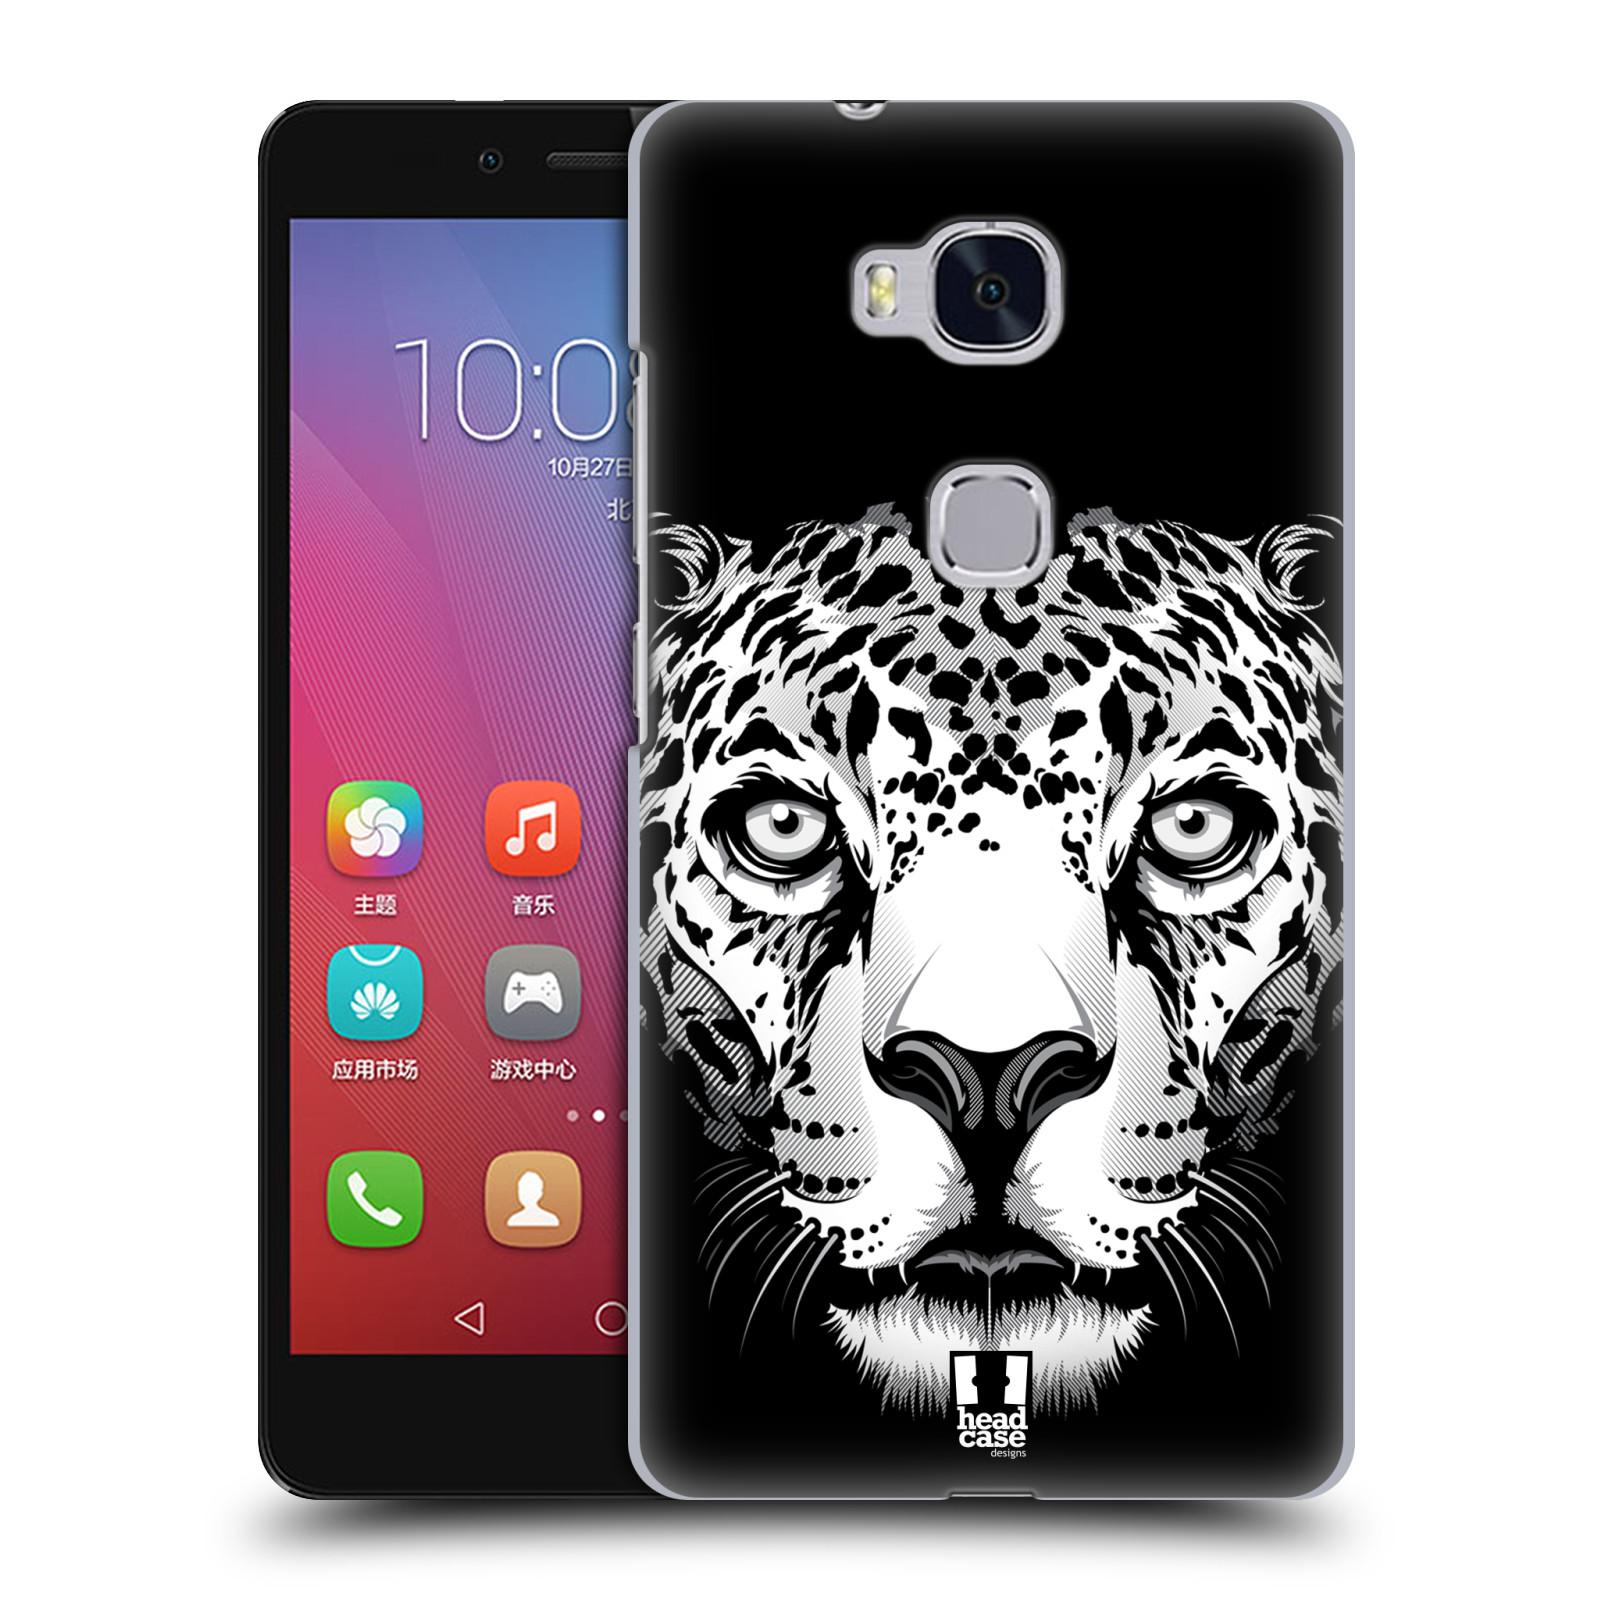 HEAD CASE pevný plastový obal na mobil HUAWEI HONOR 5X vzor Zvíře kreslená tvář leopard